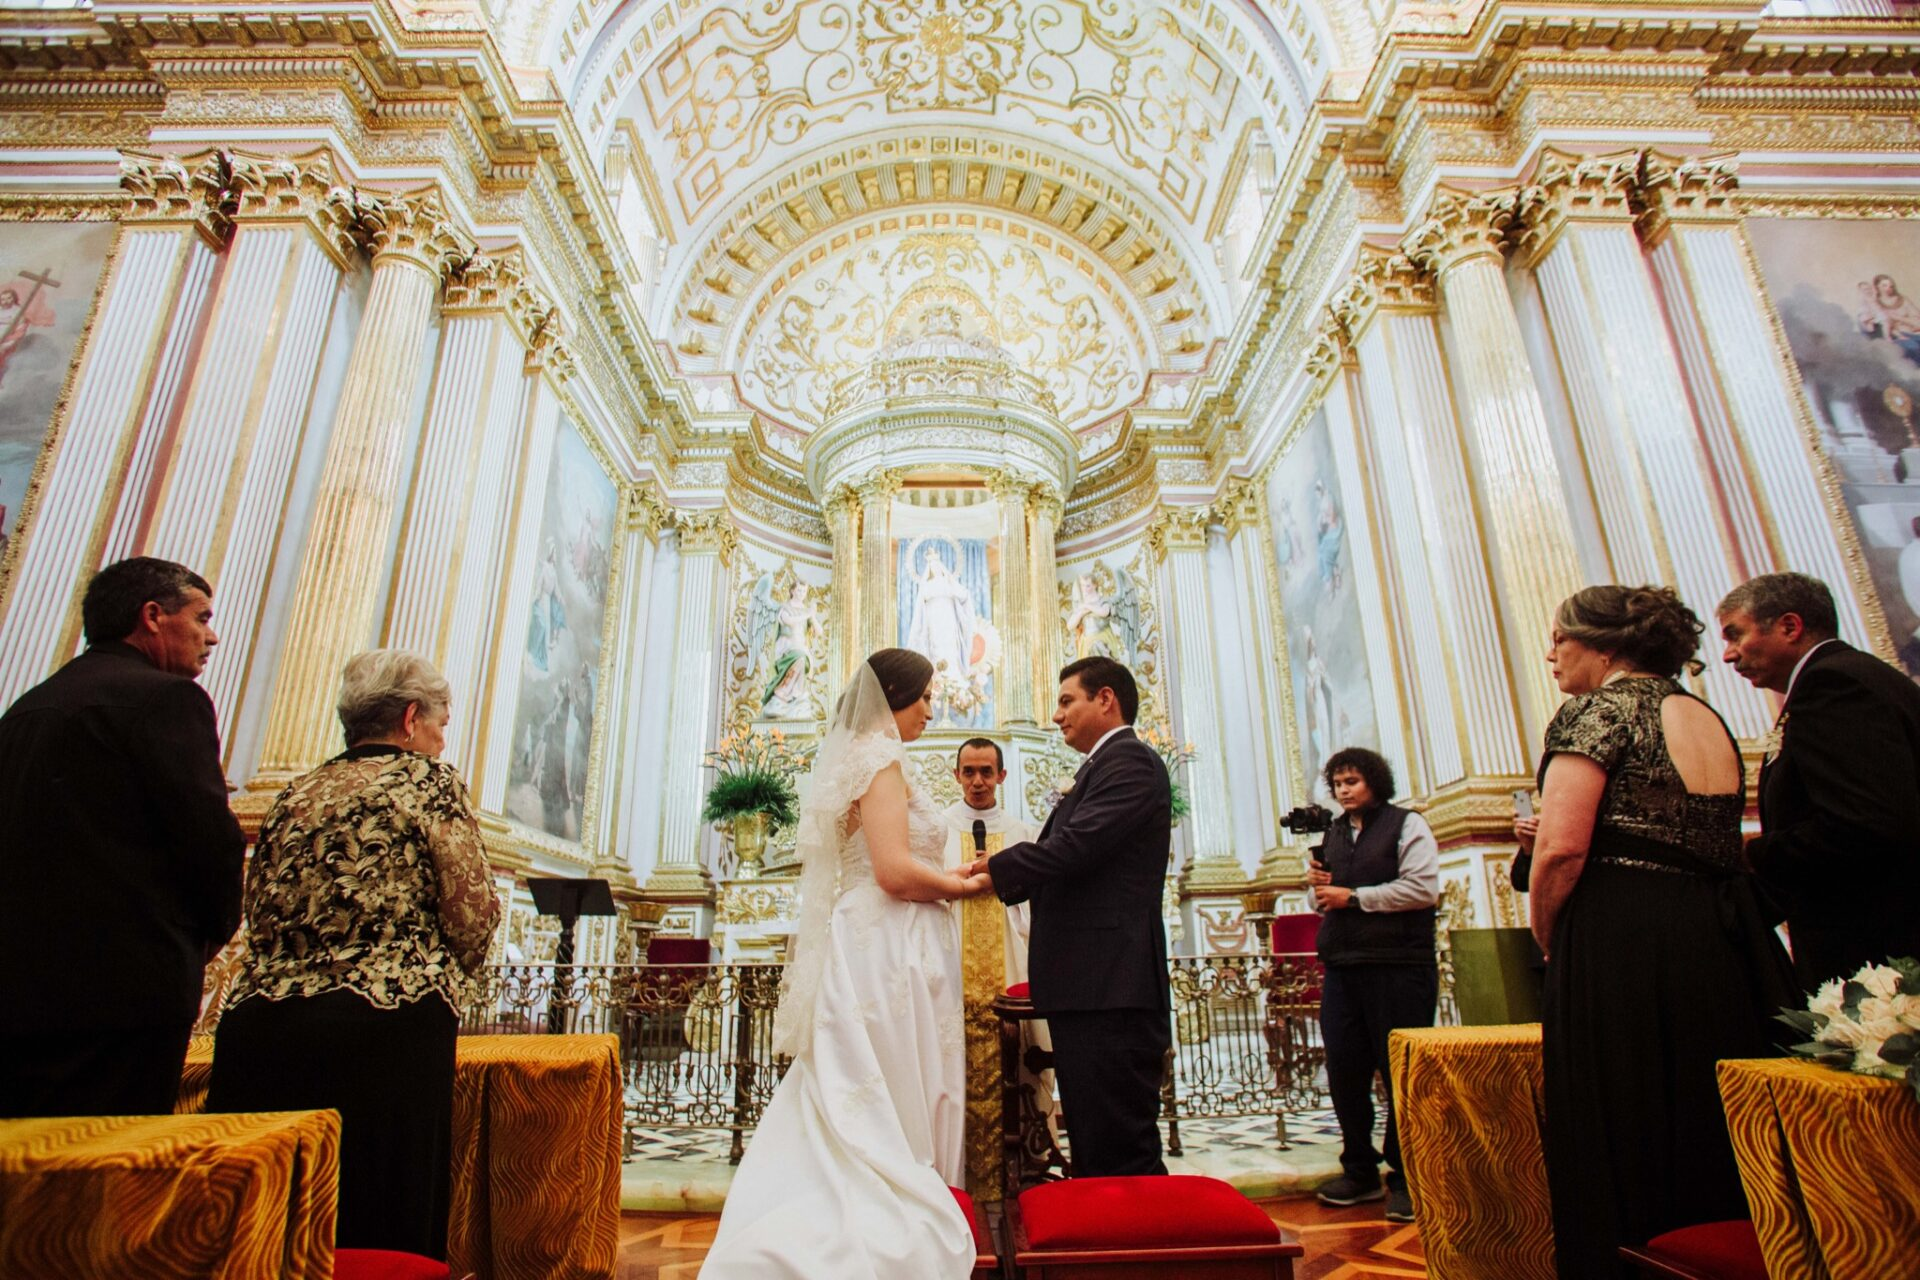 javier_noriega_fotografo_bodas_centro_platero_zacatecas_wedding_photographer11